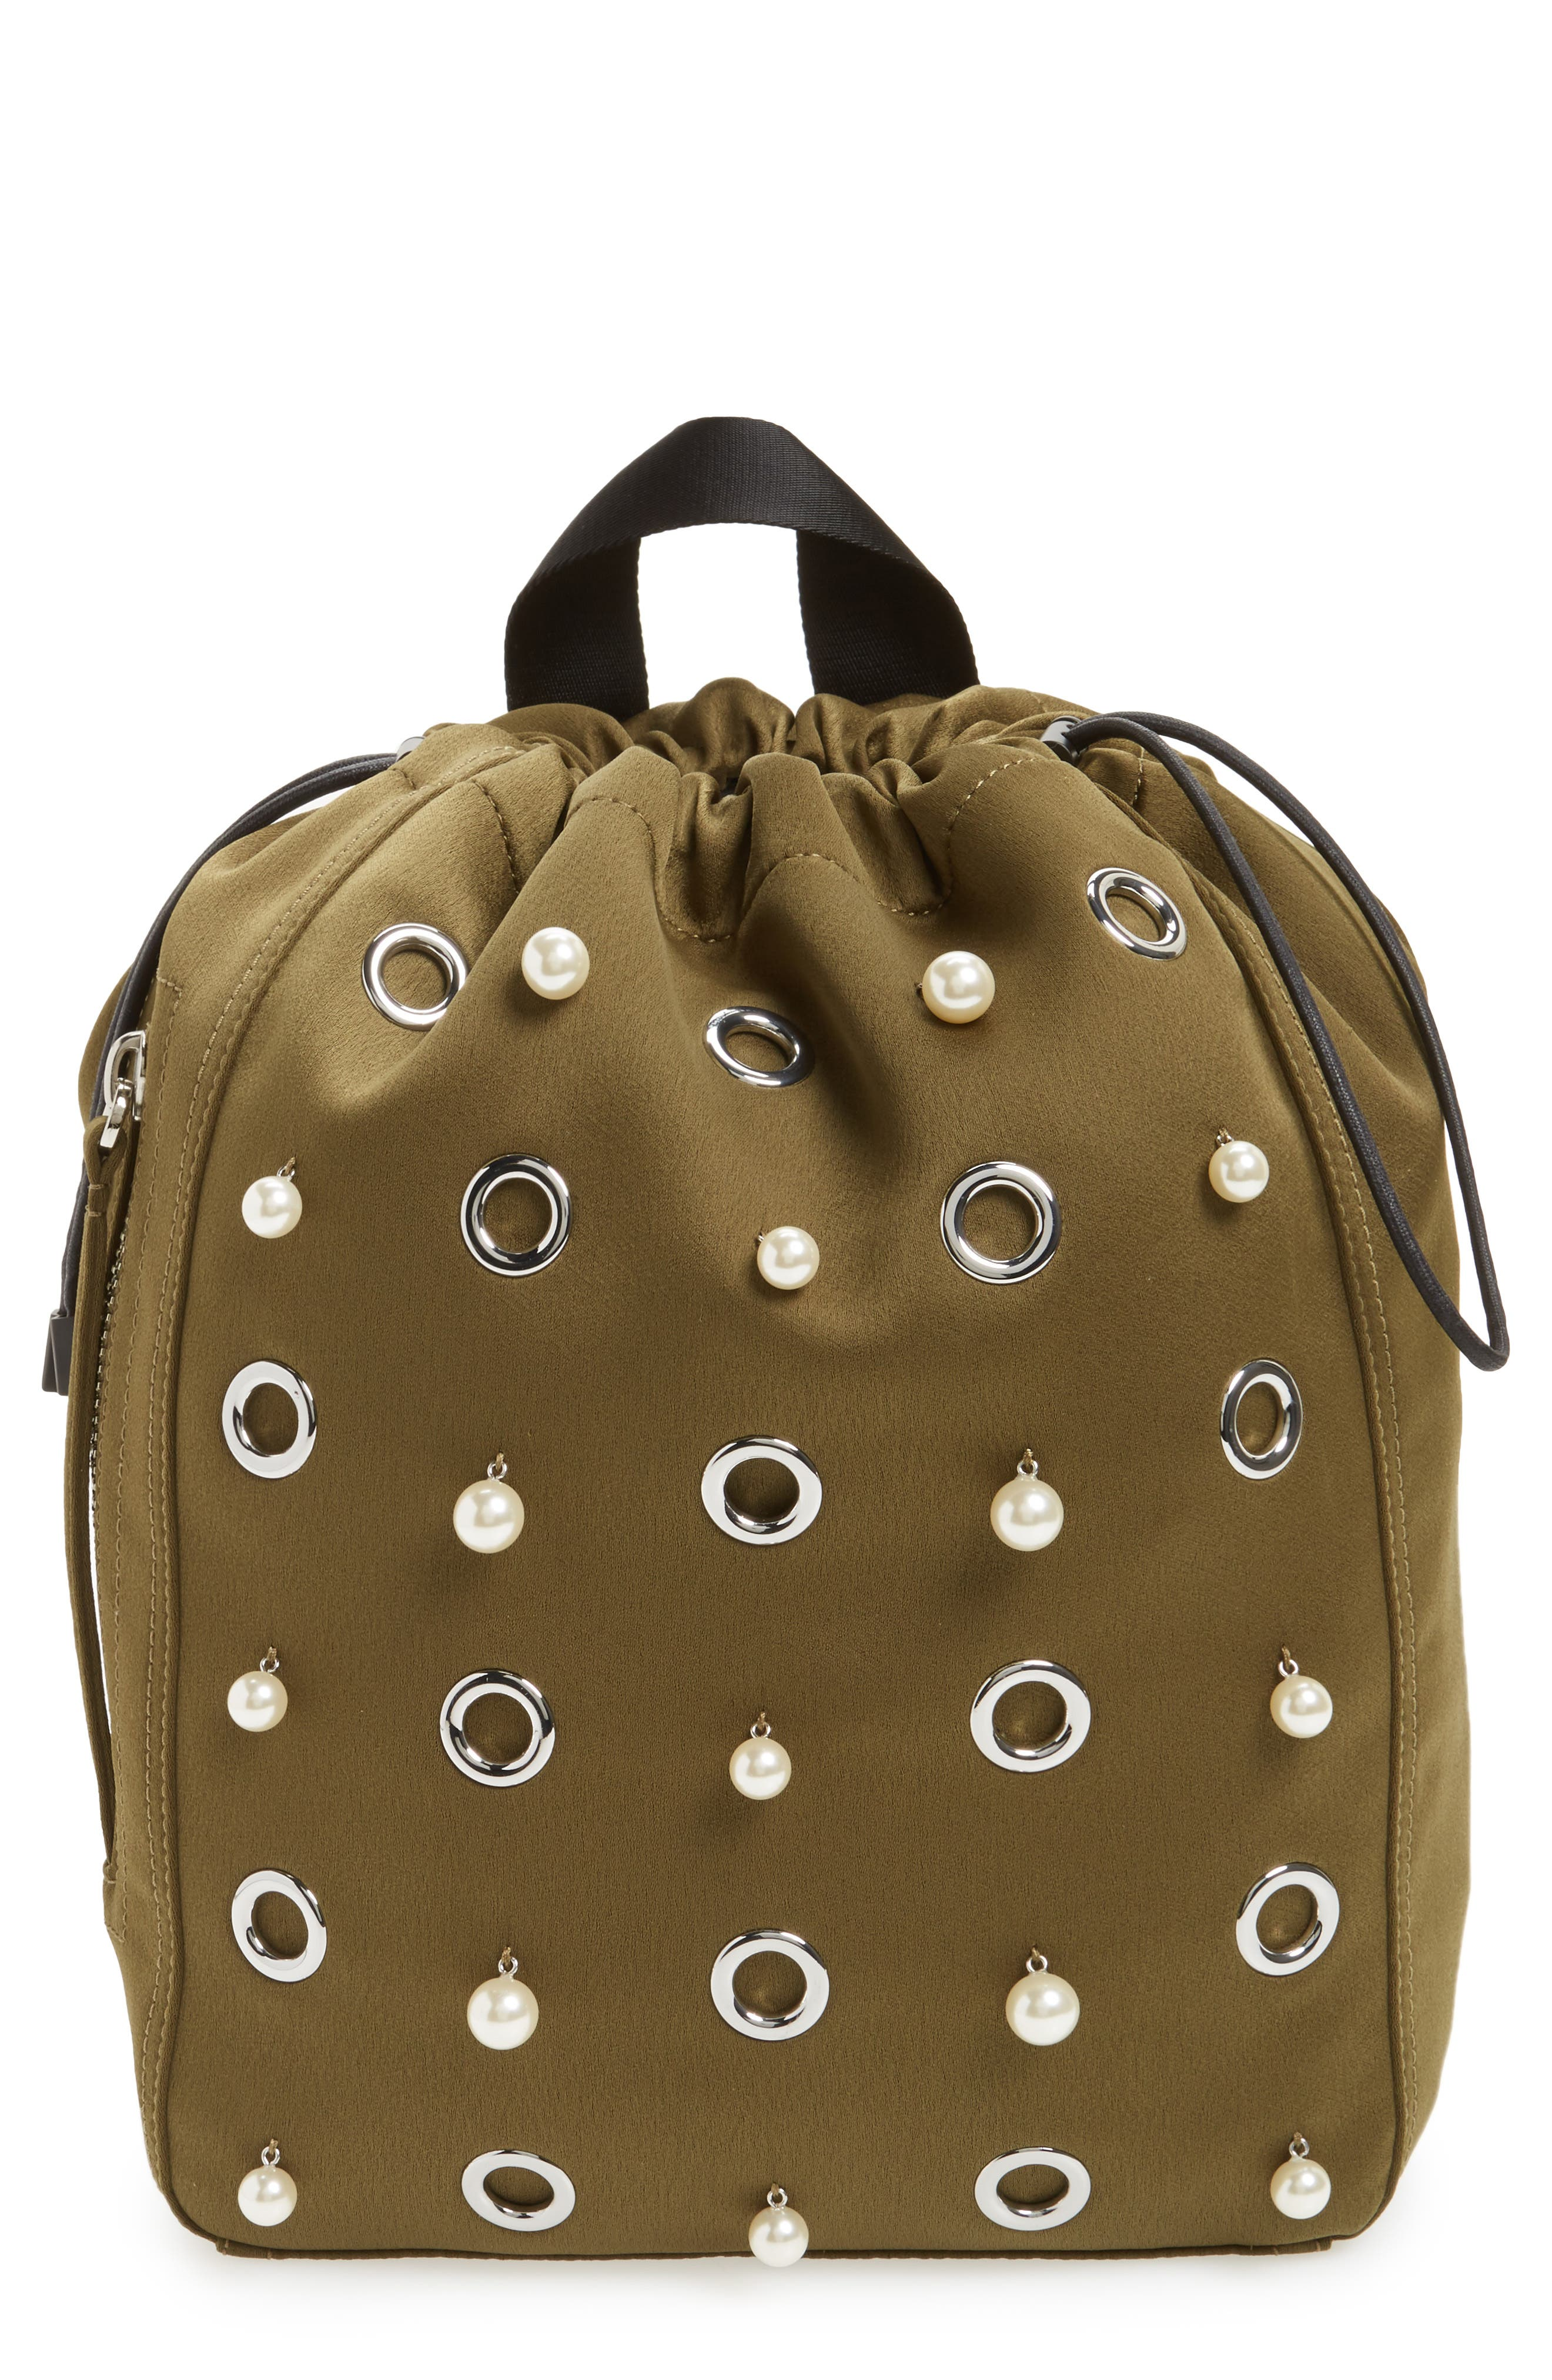 Phillip Lim 3.1 Medium Go-Go Embellished Backpack,                             Main thumbnail 1, color,                             Moss